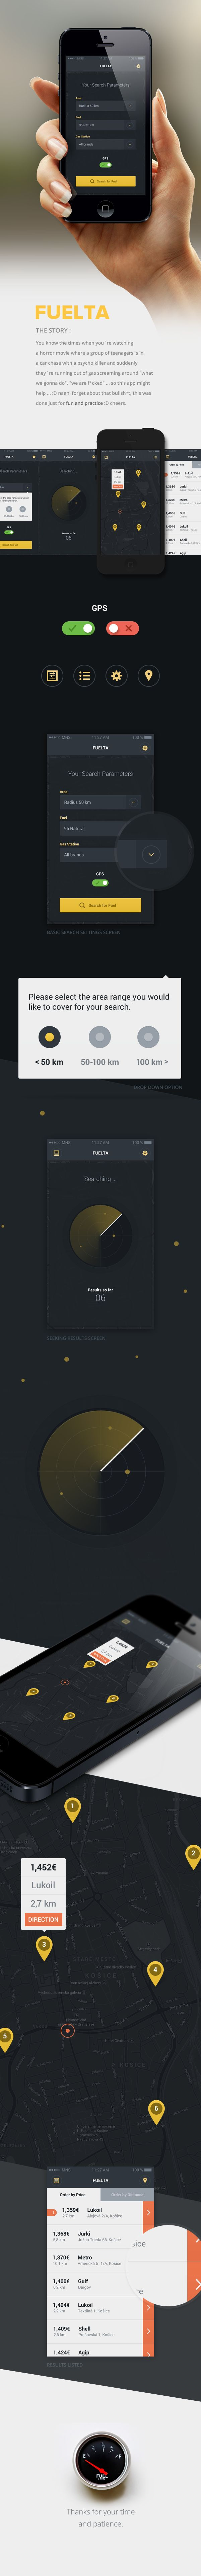 Fuelta - app concept on Behance